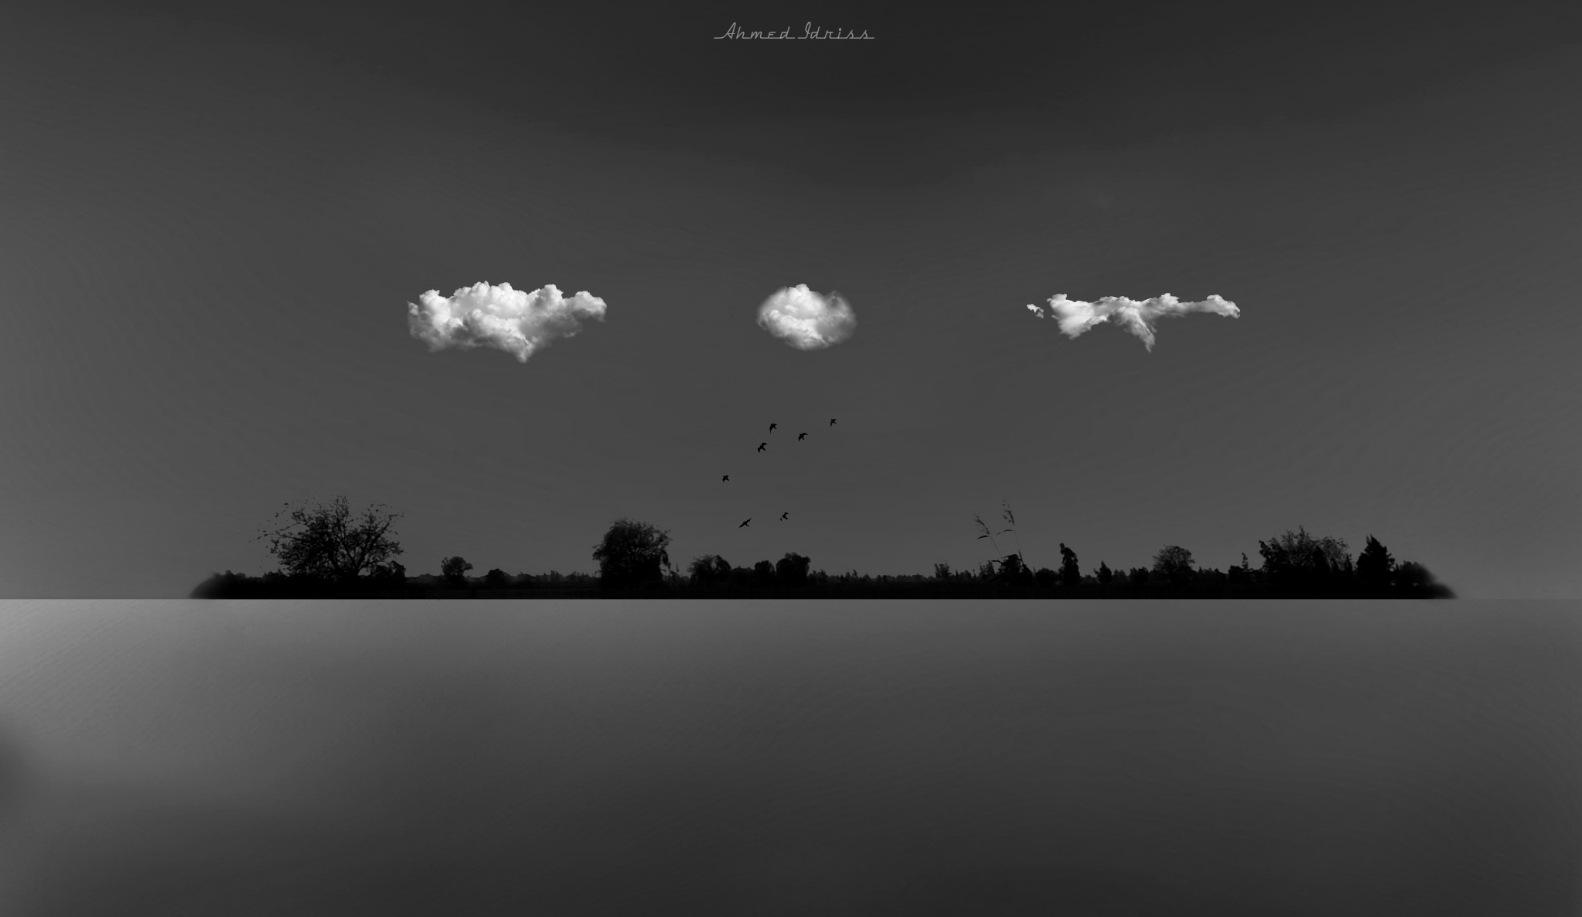 Island  by Ahmed Idris